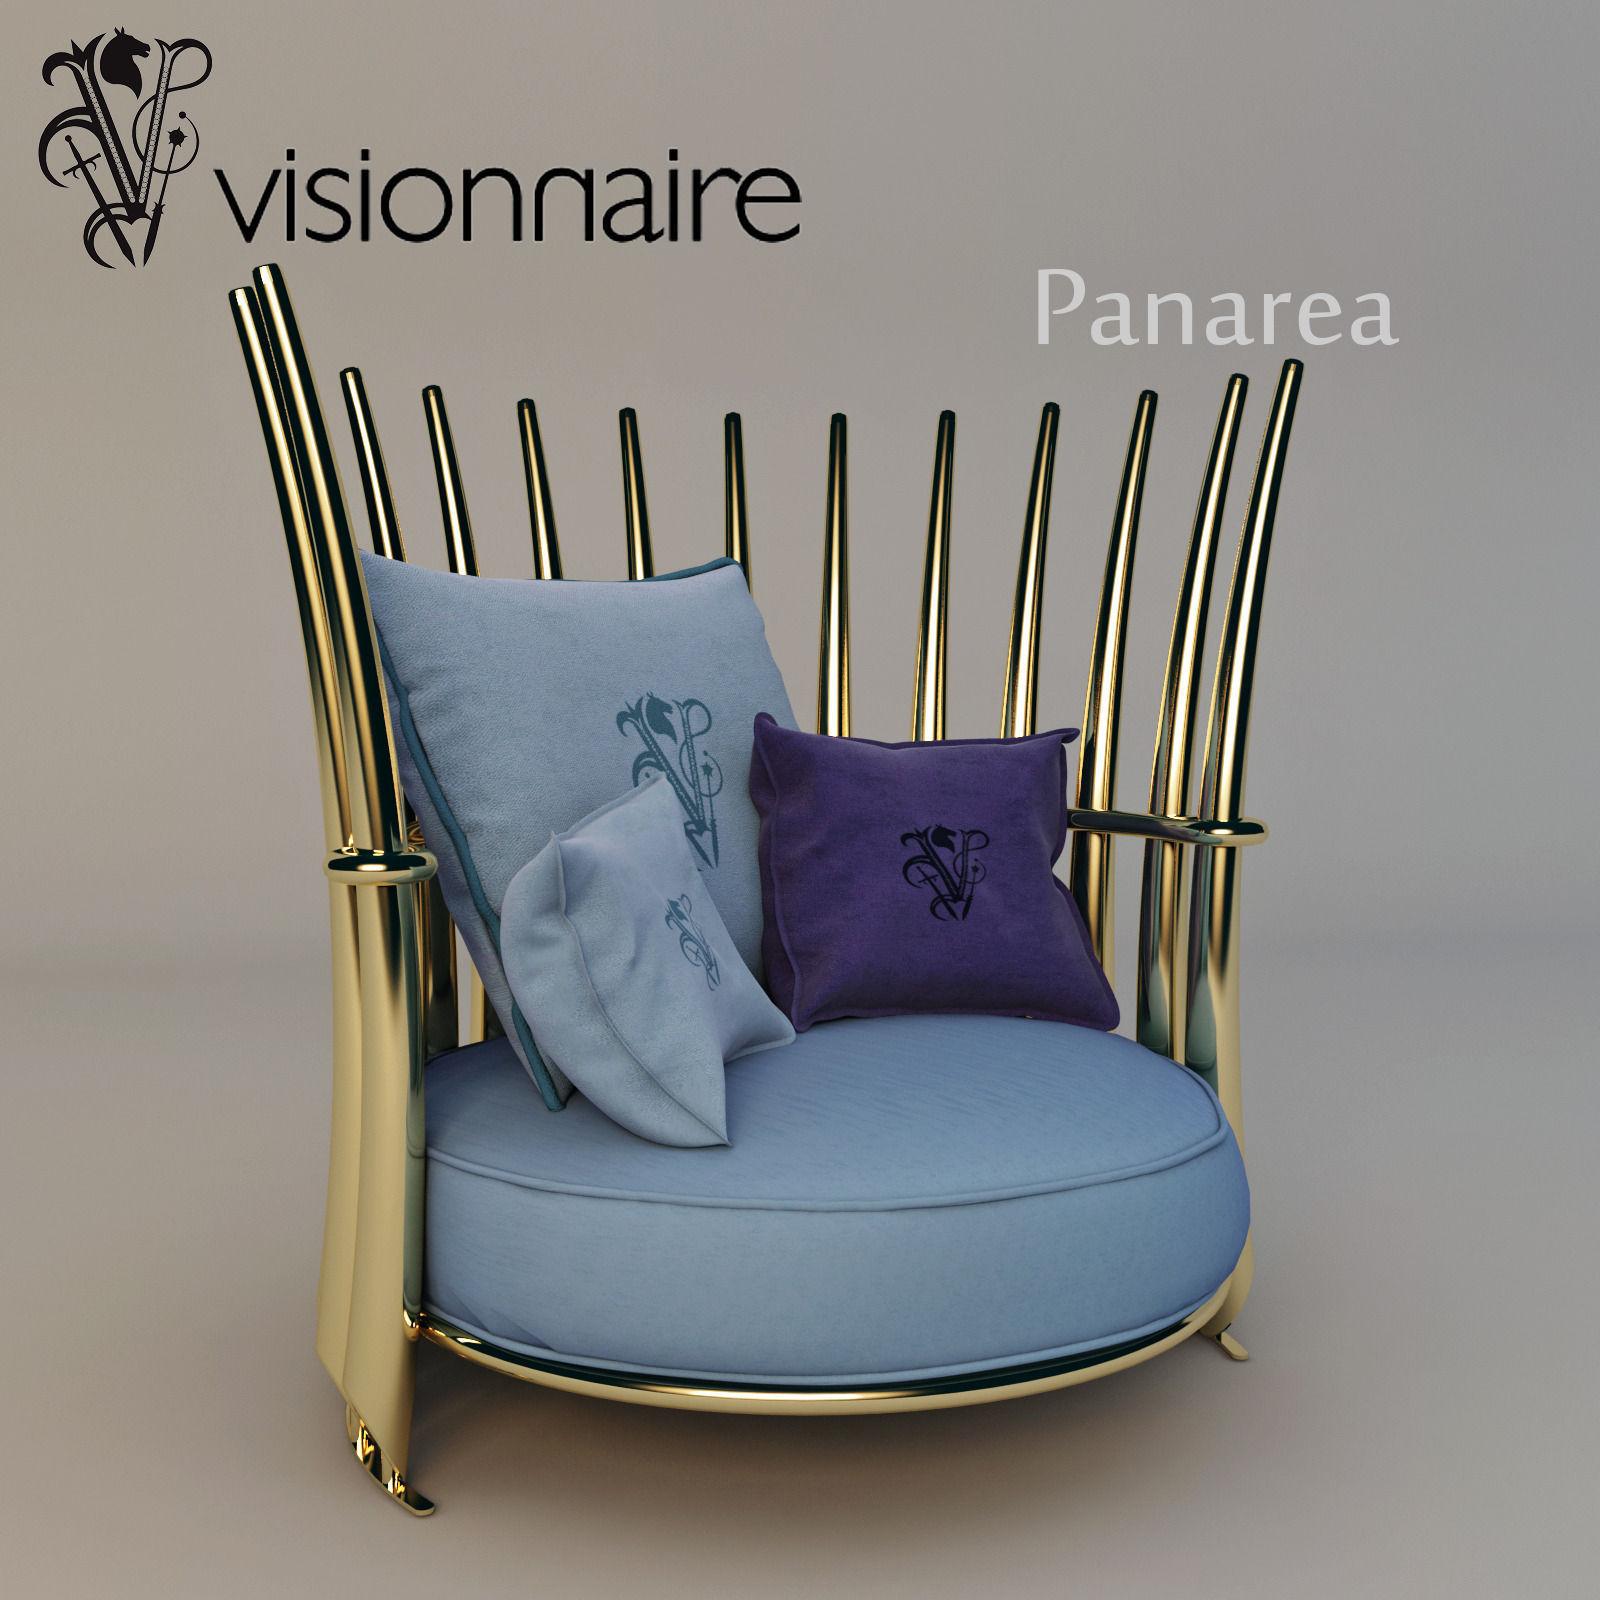 Visionnaire Panarea armchair